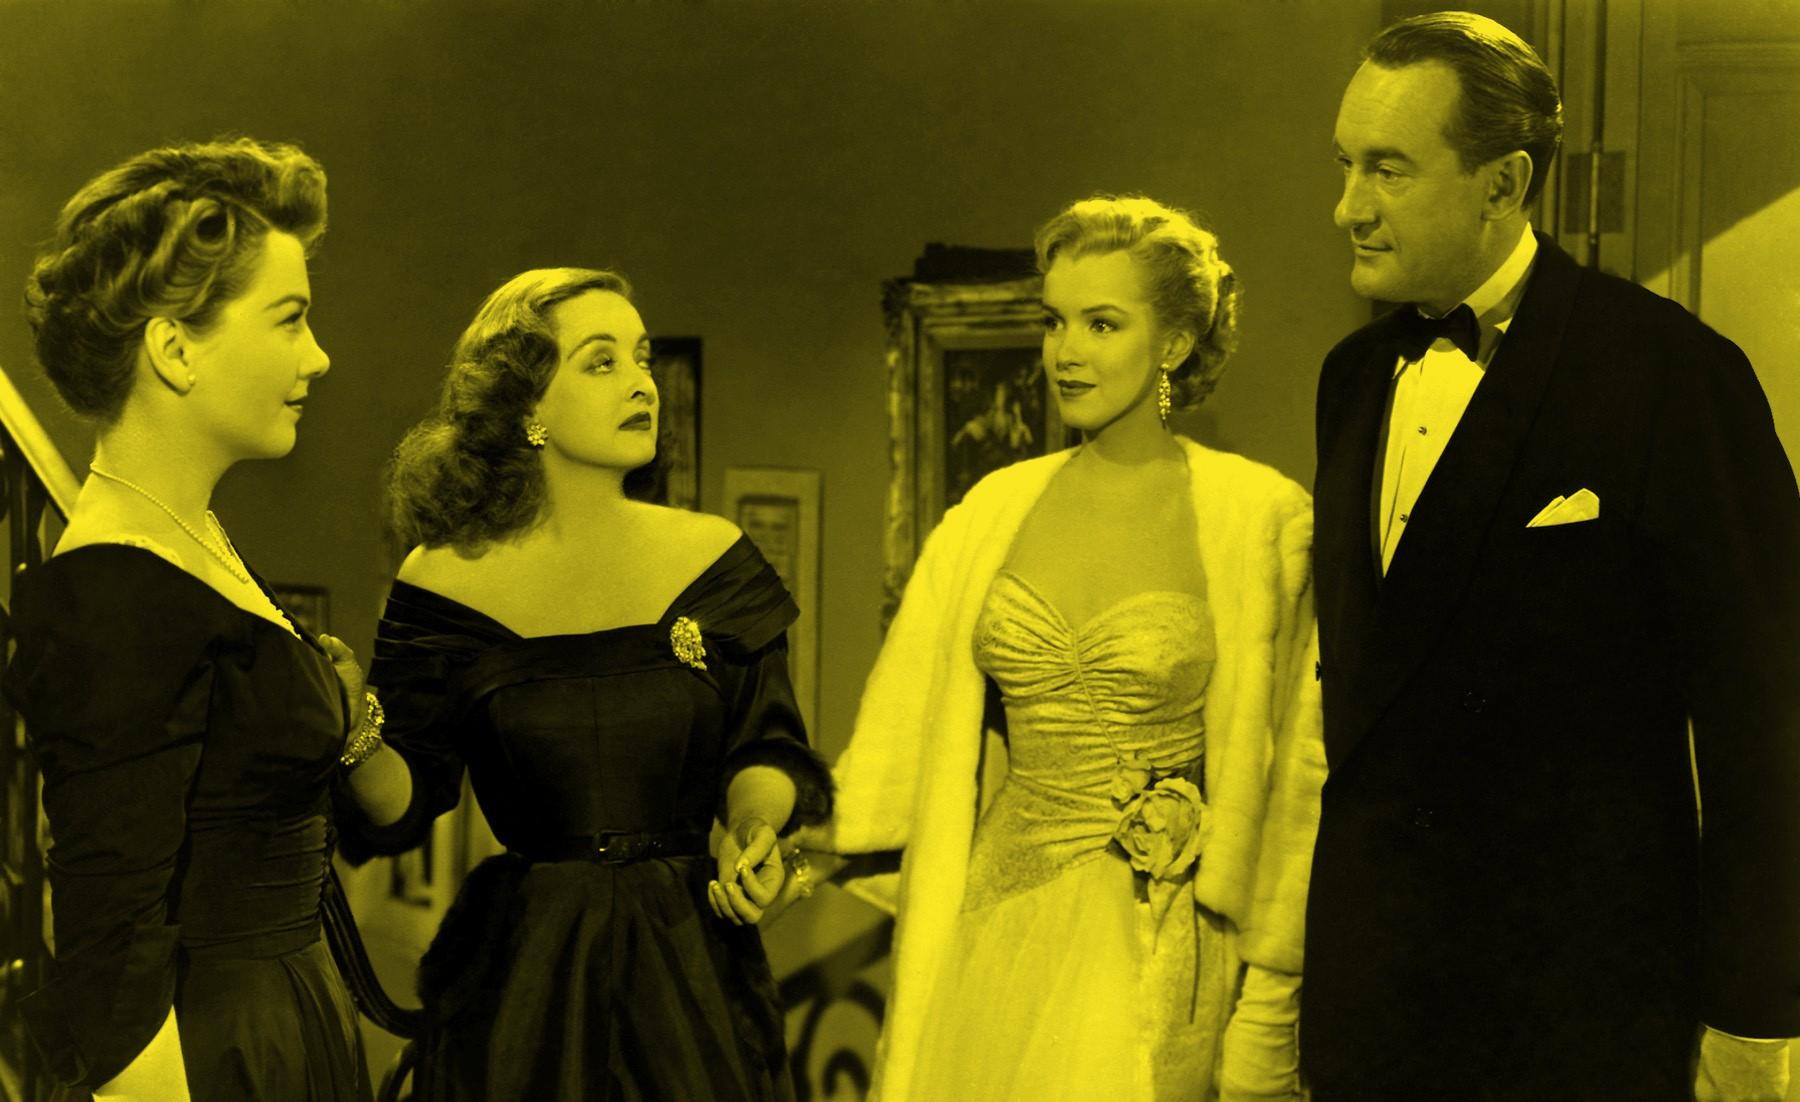 anne baxter, bette davis, marilyn monroe & george sanders – all about eve 1950